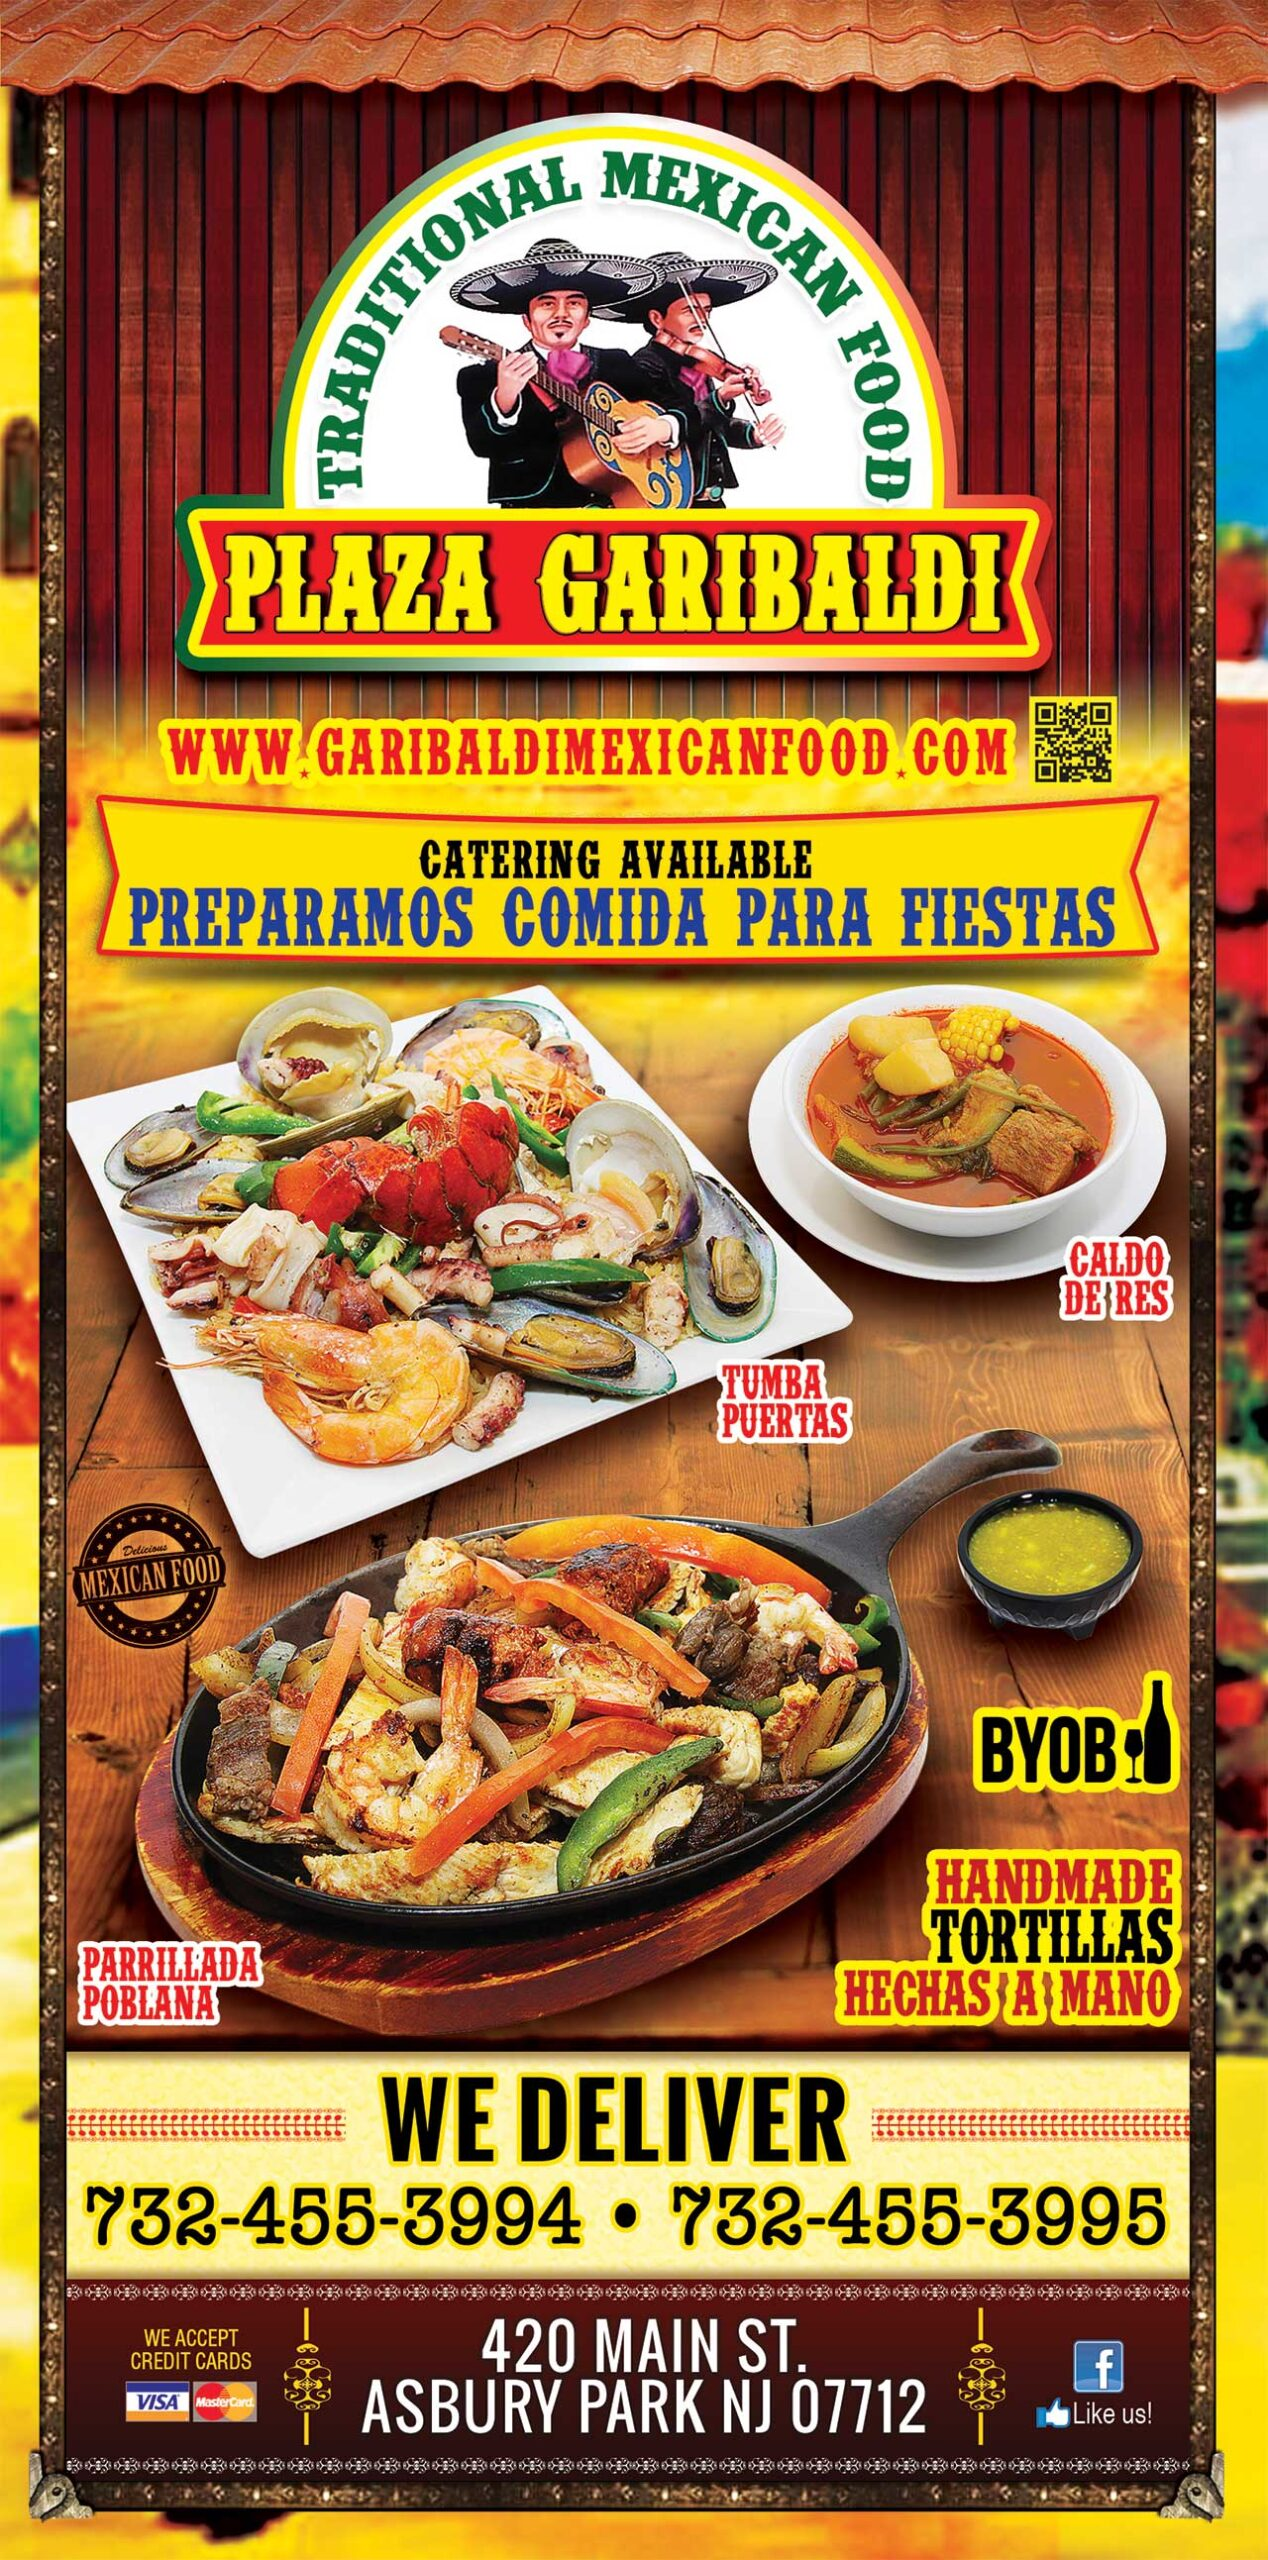 PlazaGaribaldi-Menu-Page-1